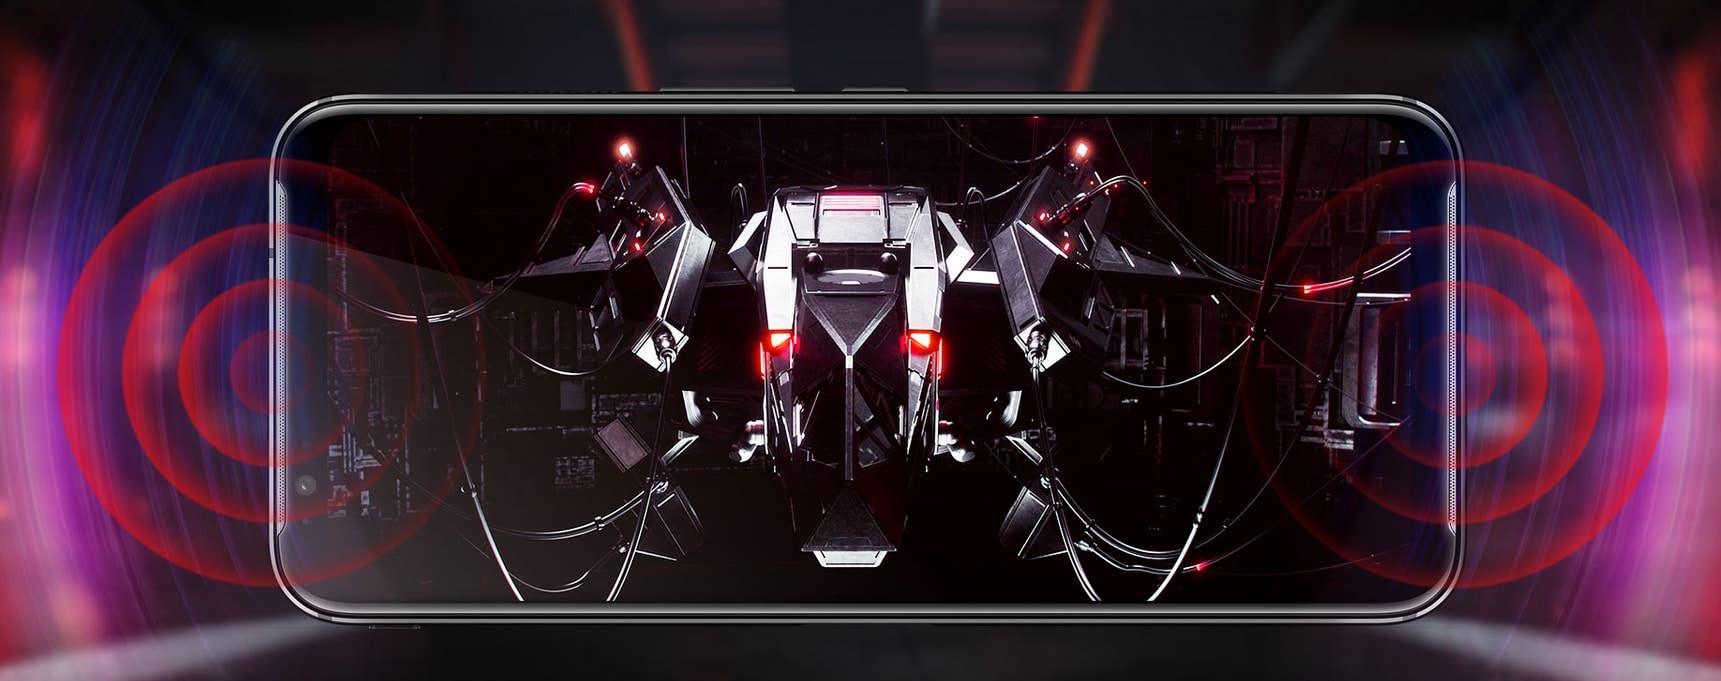 Nubia เปิดตัว Red Magic 3 มือถือเพื่อการเล่นเกม ใช้ SNAP855 จอ 90 Hz มีพัดลมระบายอากาศ 3